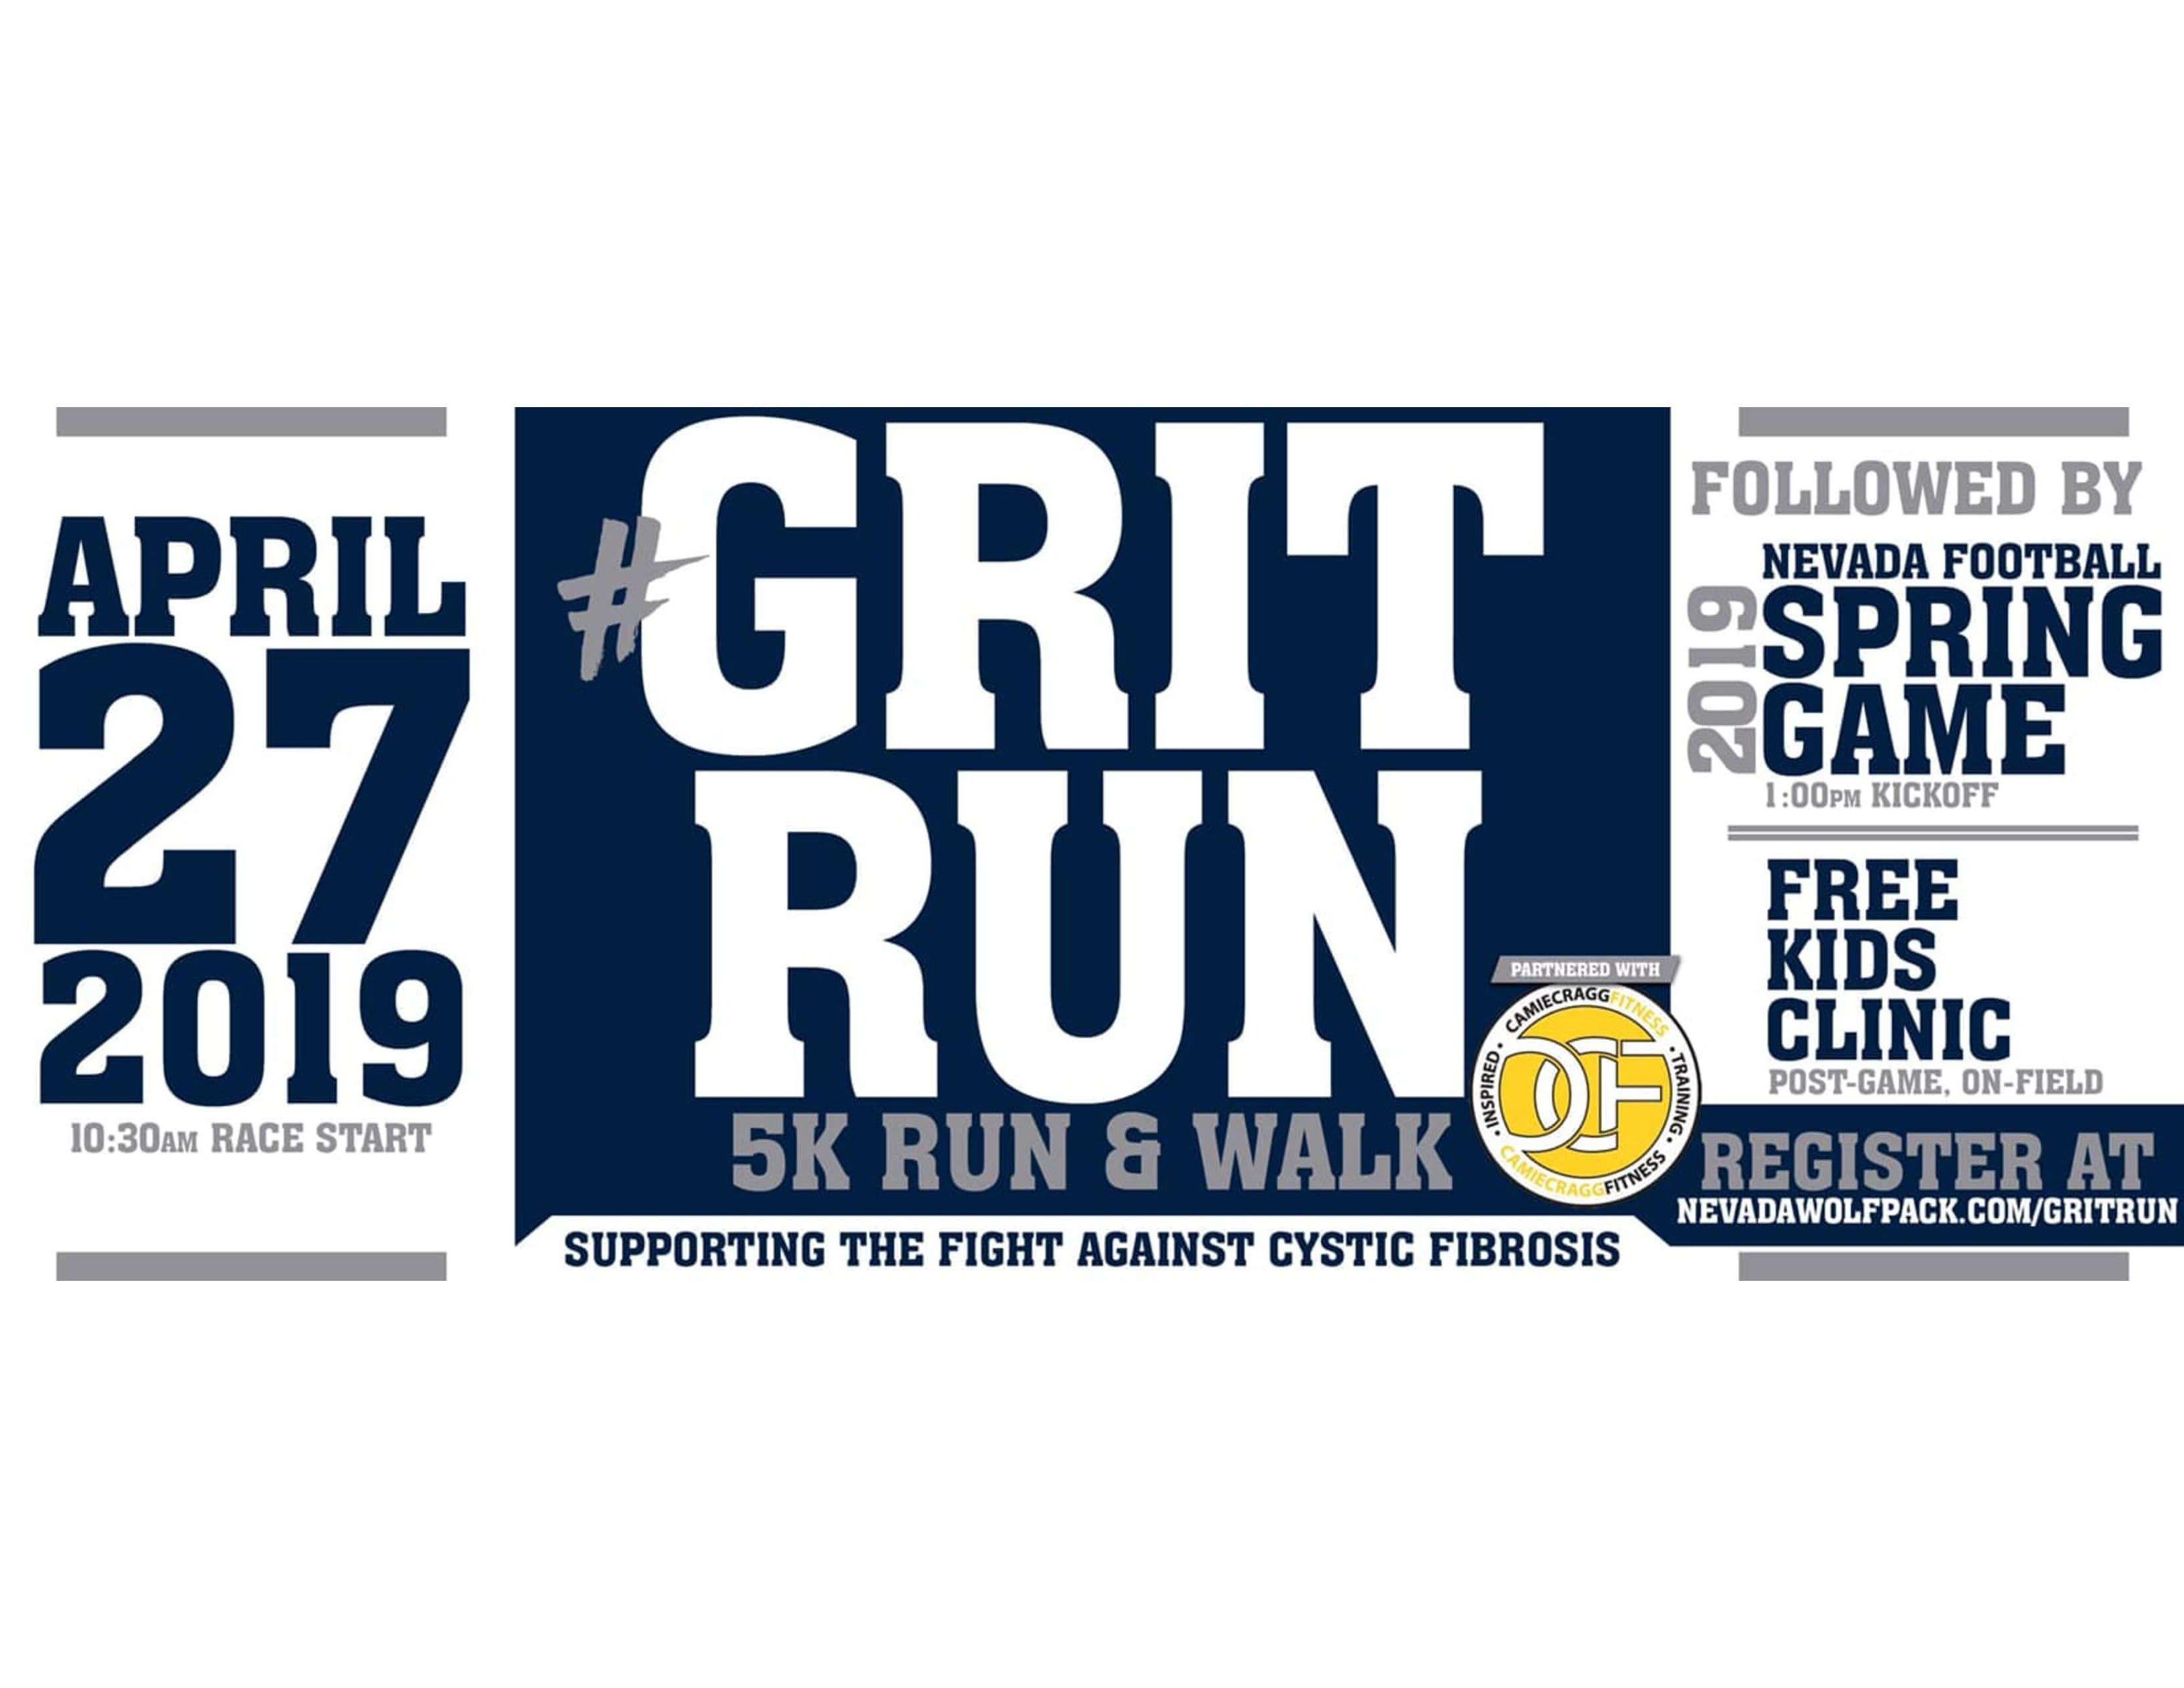 GRIT RUN 5k Run and Walk Feauted